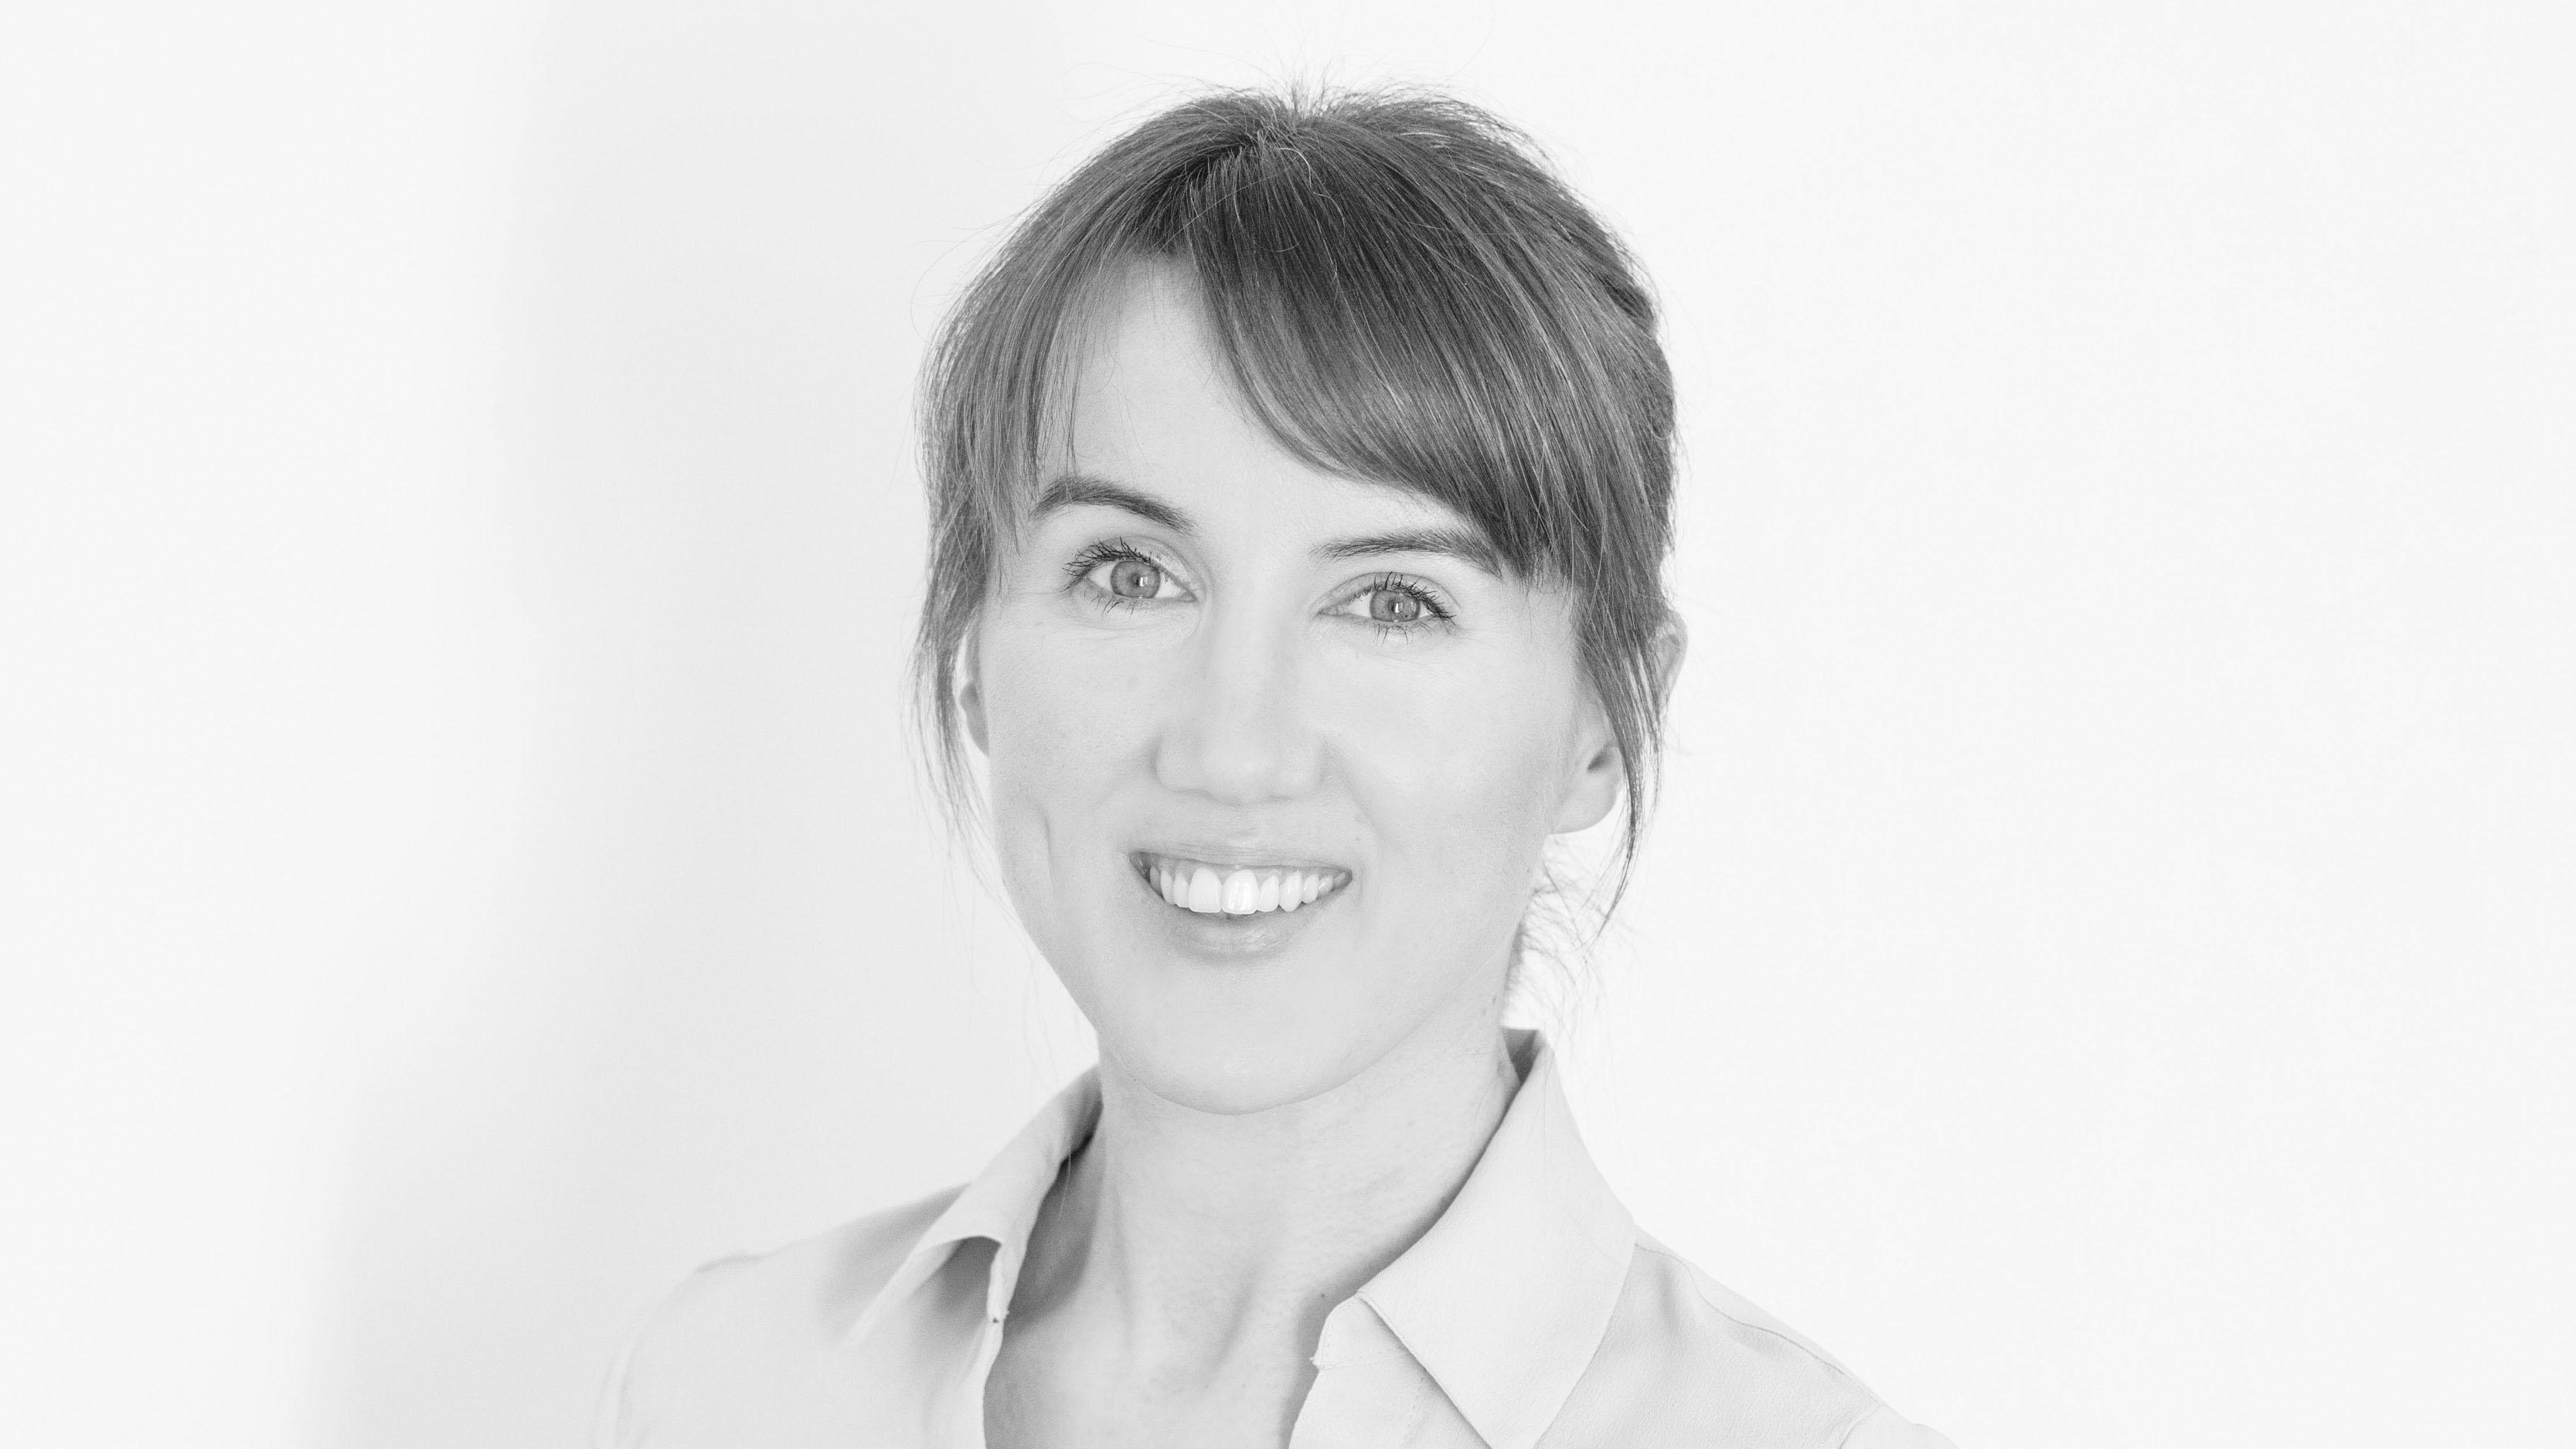 Anastasia Breunig